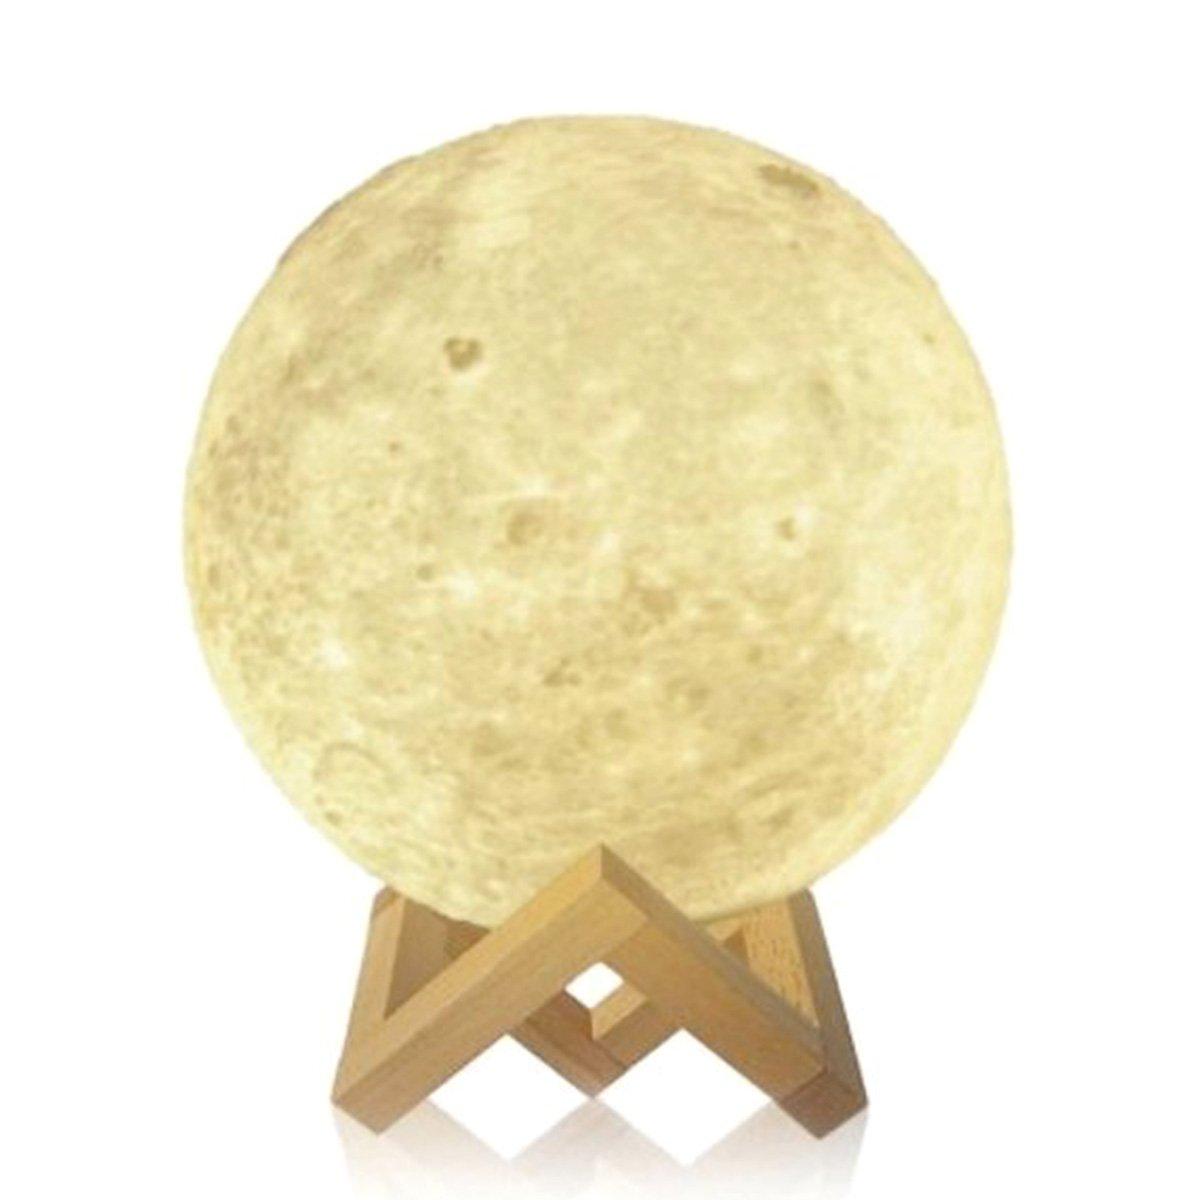 Tooarts 3D Printing Light Charging Luna Moon Lamp Modern Sculpture Bedroom Night Light Decoration Gift 14cm